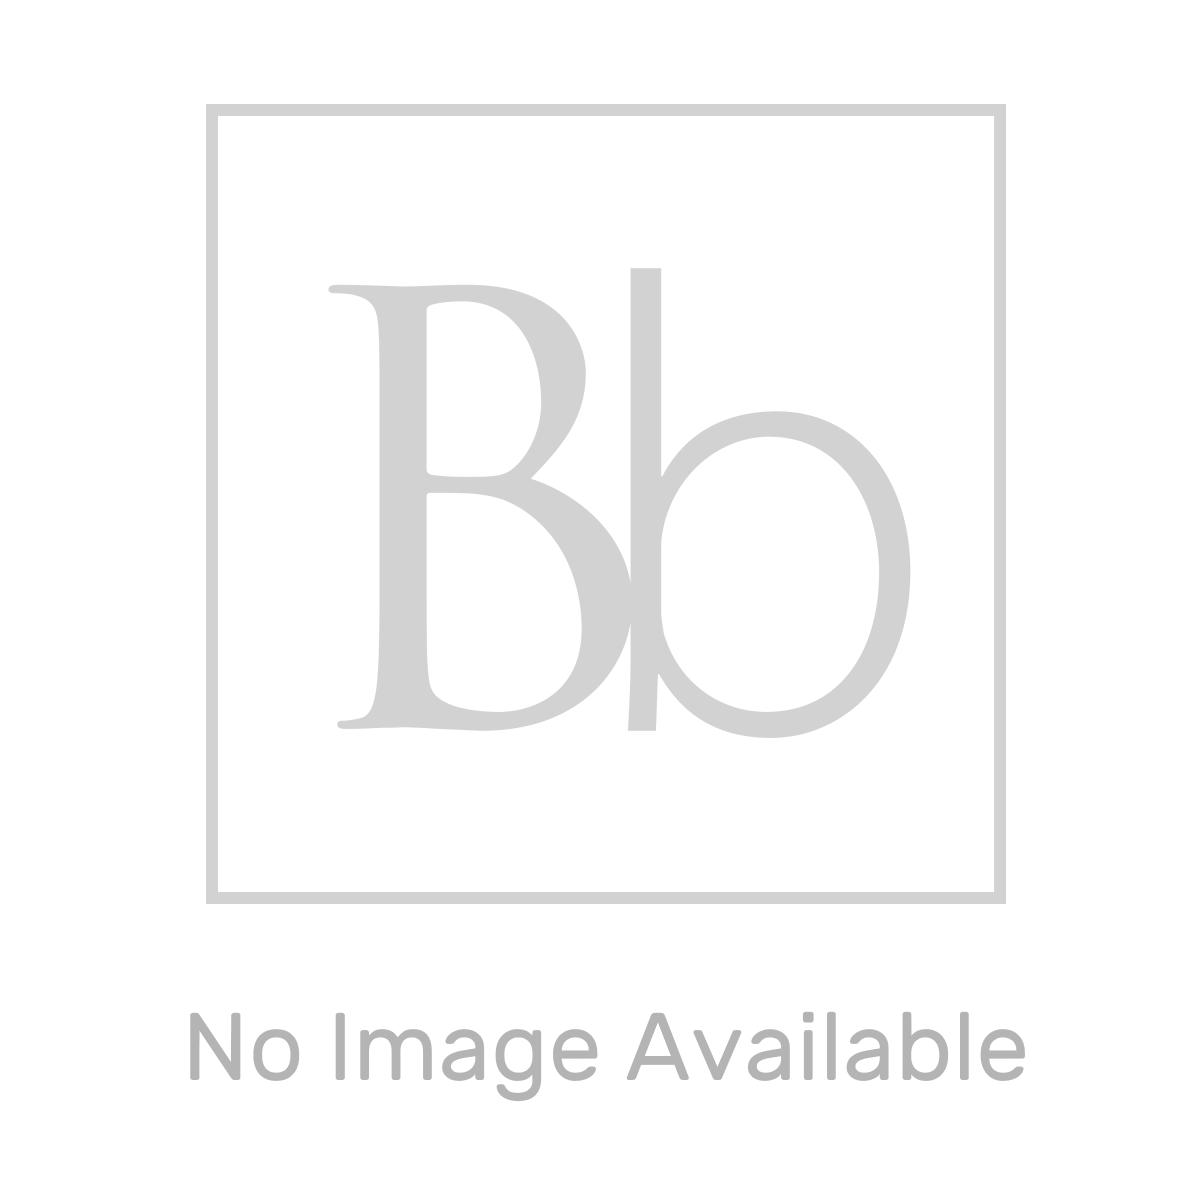 Prestige Frameless 4 Fold Left Hand Bath Screen Bracket